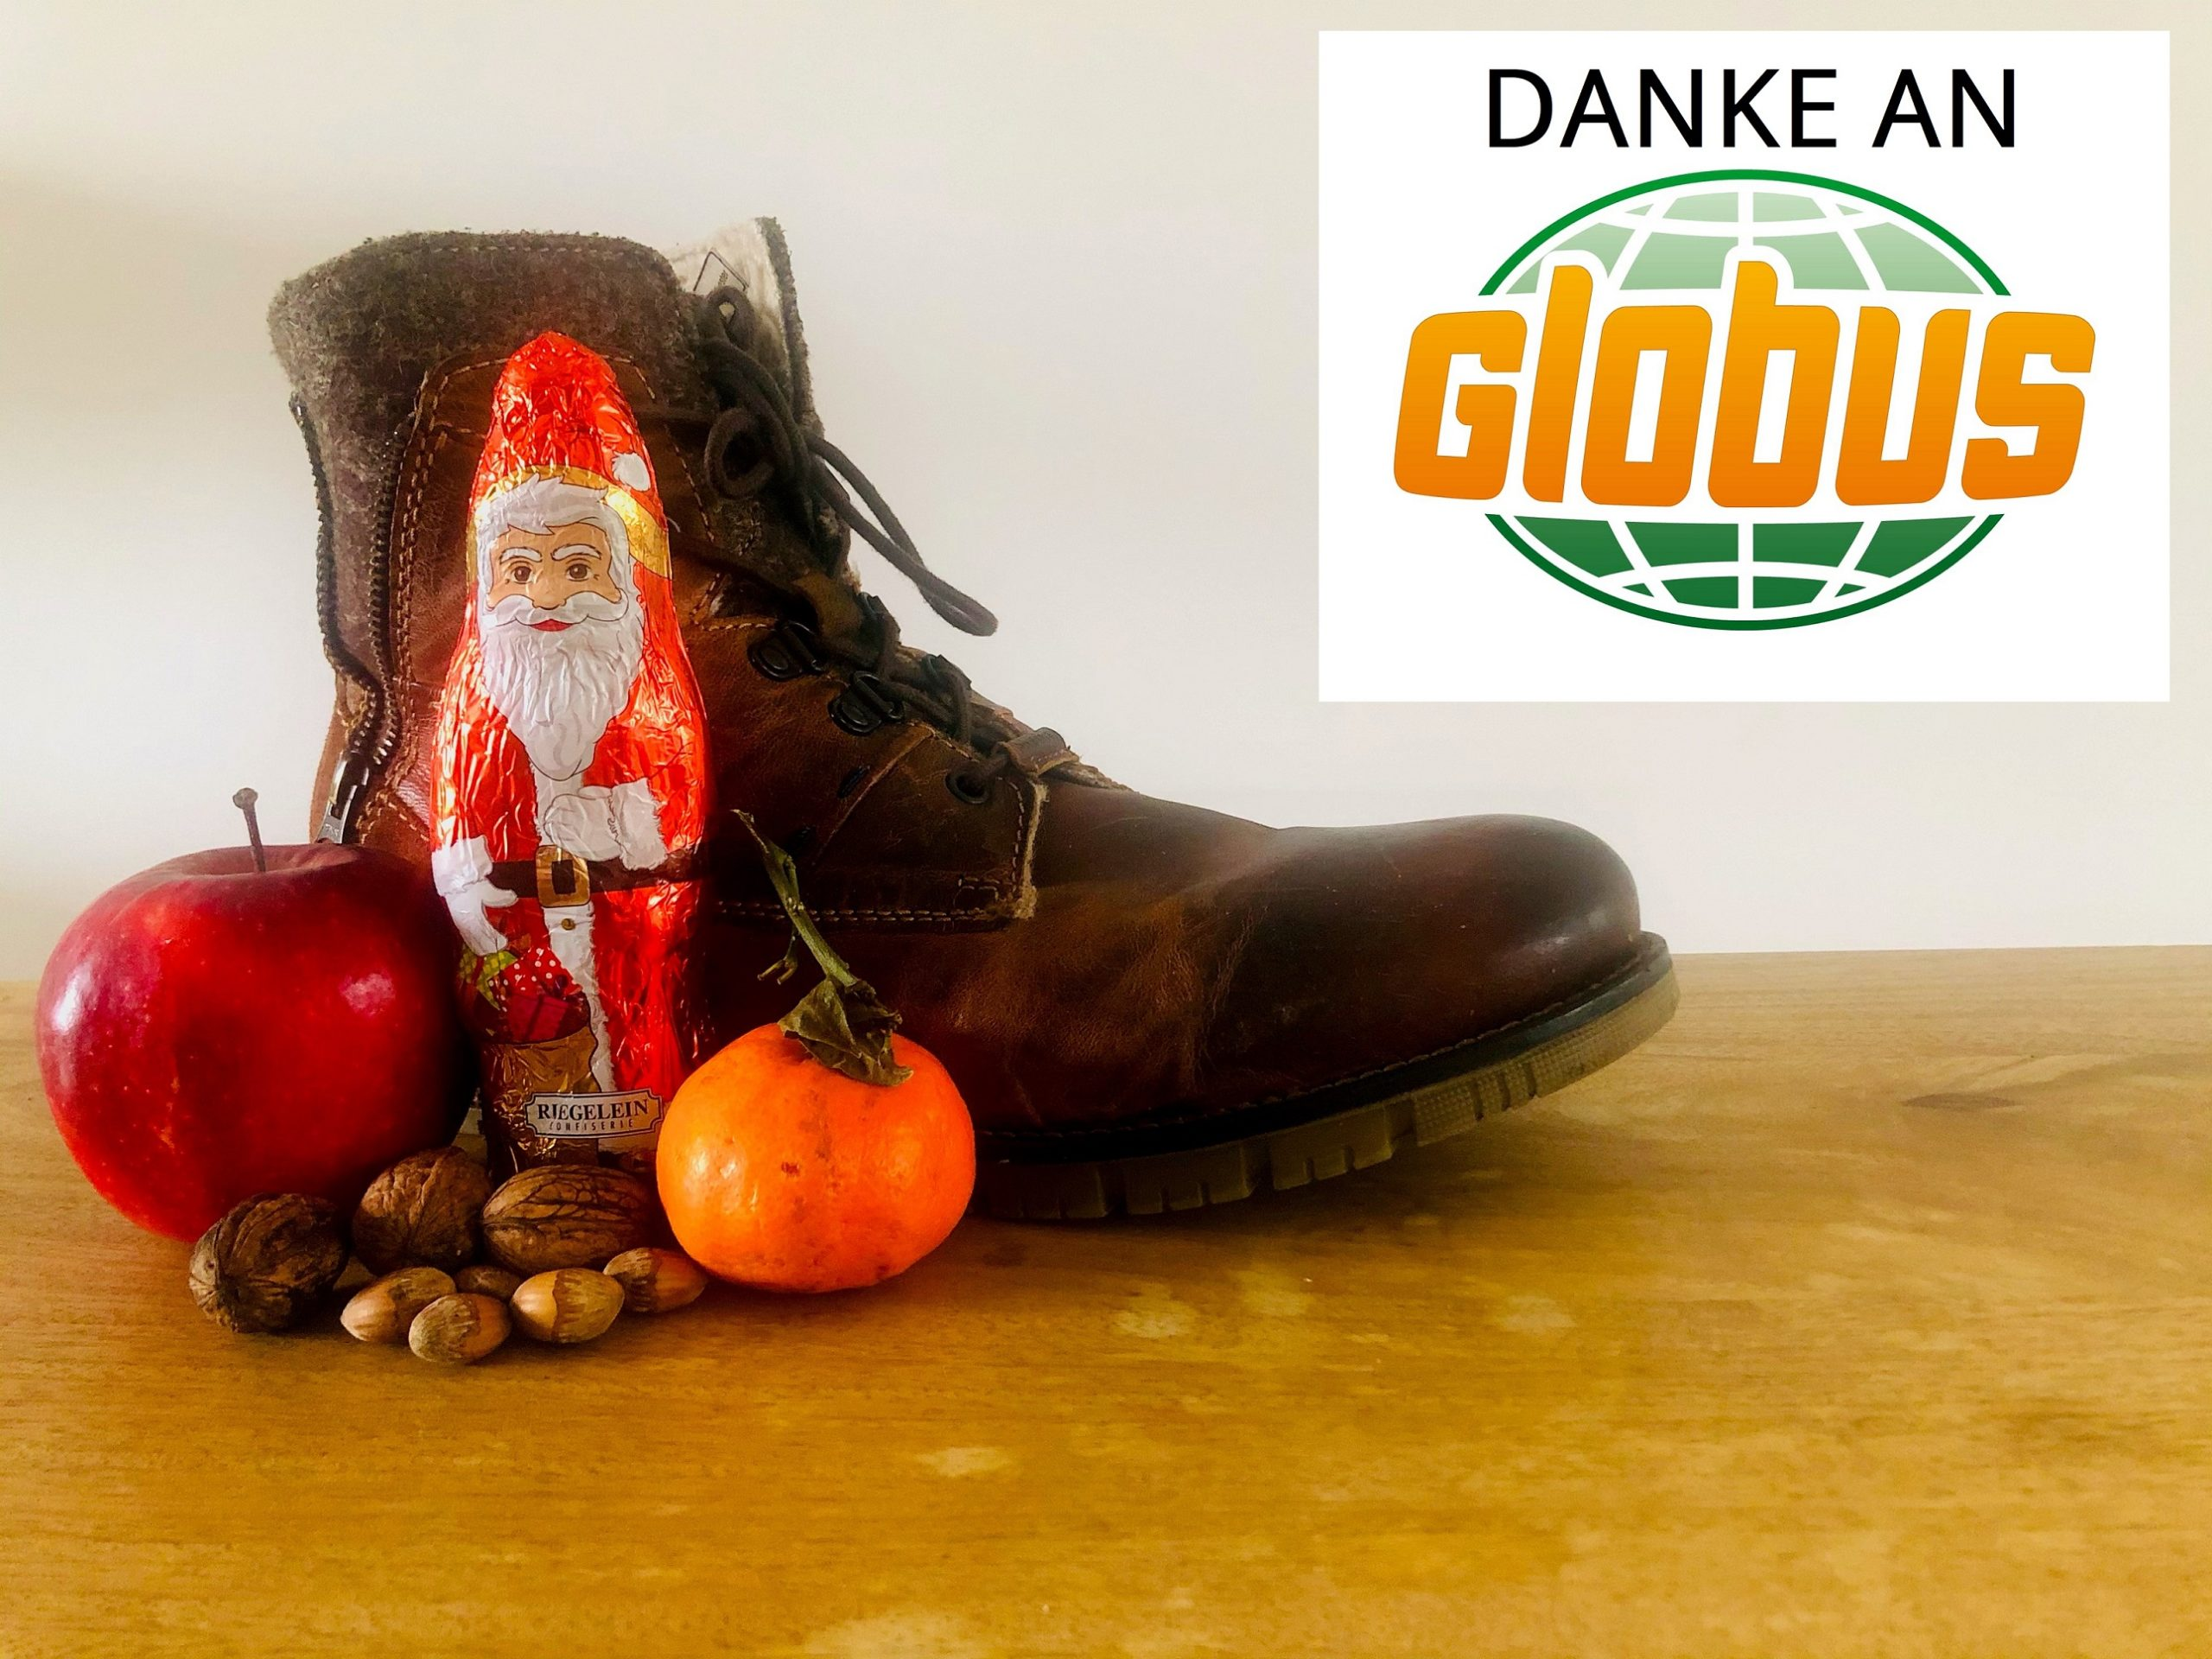 https://www.lebenshilfe-rek.de/wp-content/uploads/2020/12/Nikolausstiefel-Globus-scaled.jpg